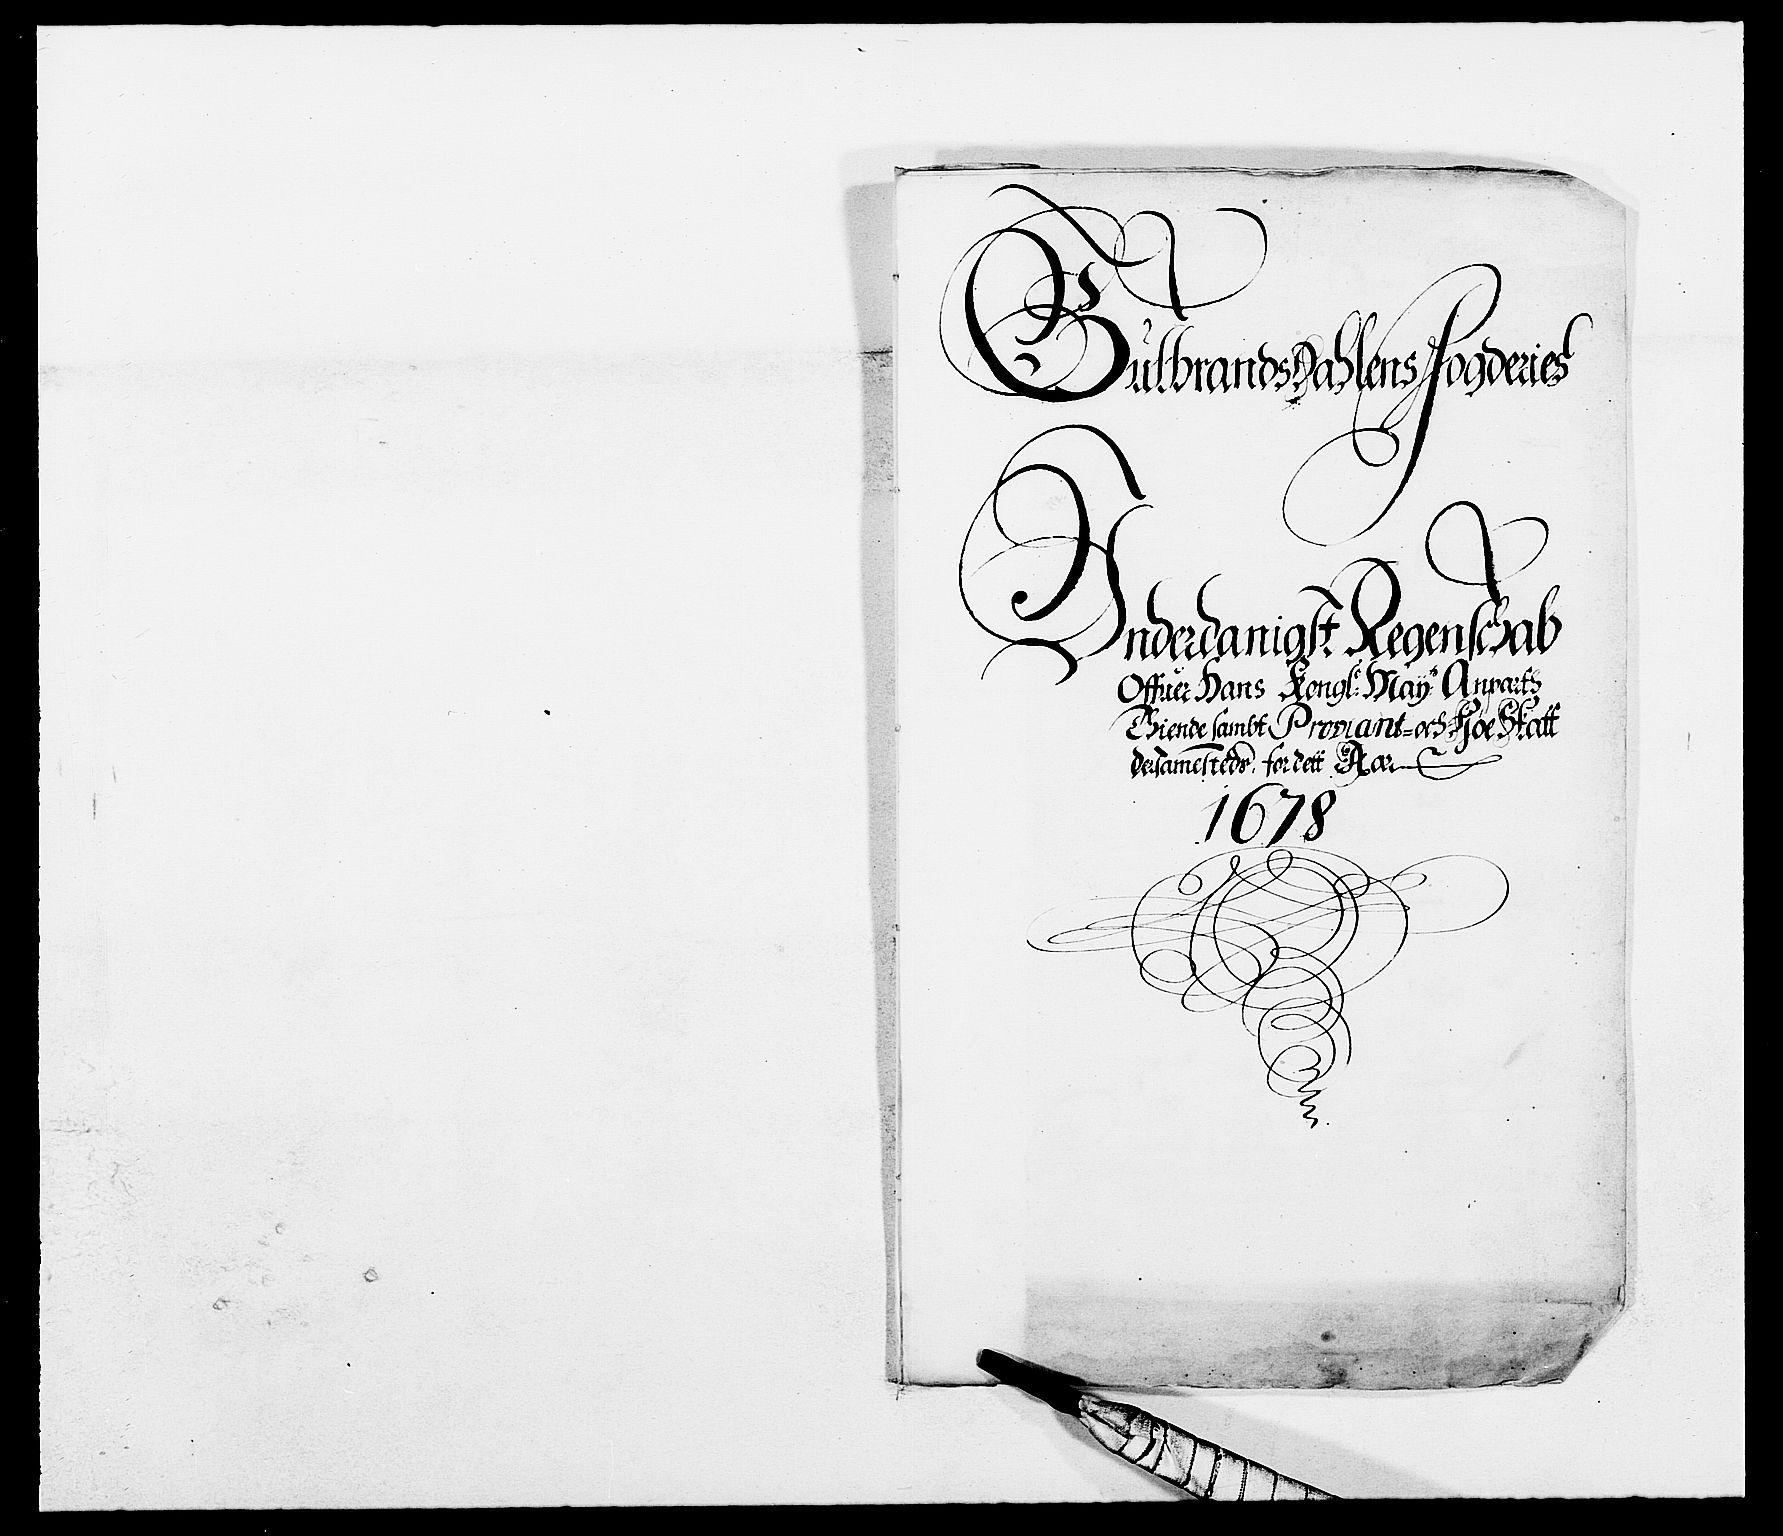 RA, Rentekammeret inntil 1814, Reviderte regnskaper, Fogderegnskap, R17/L1152: Fogderegnskap Gudbrandsdal, 1678-1679, s. 21